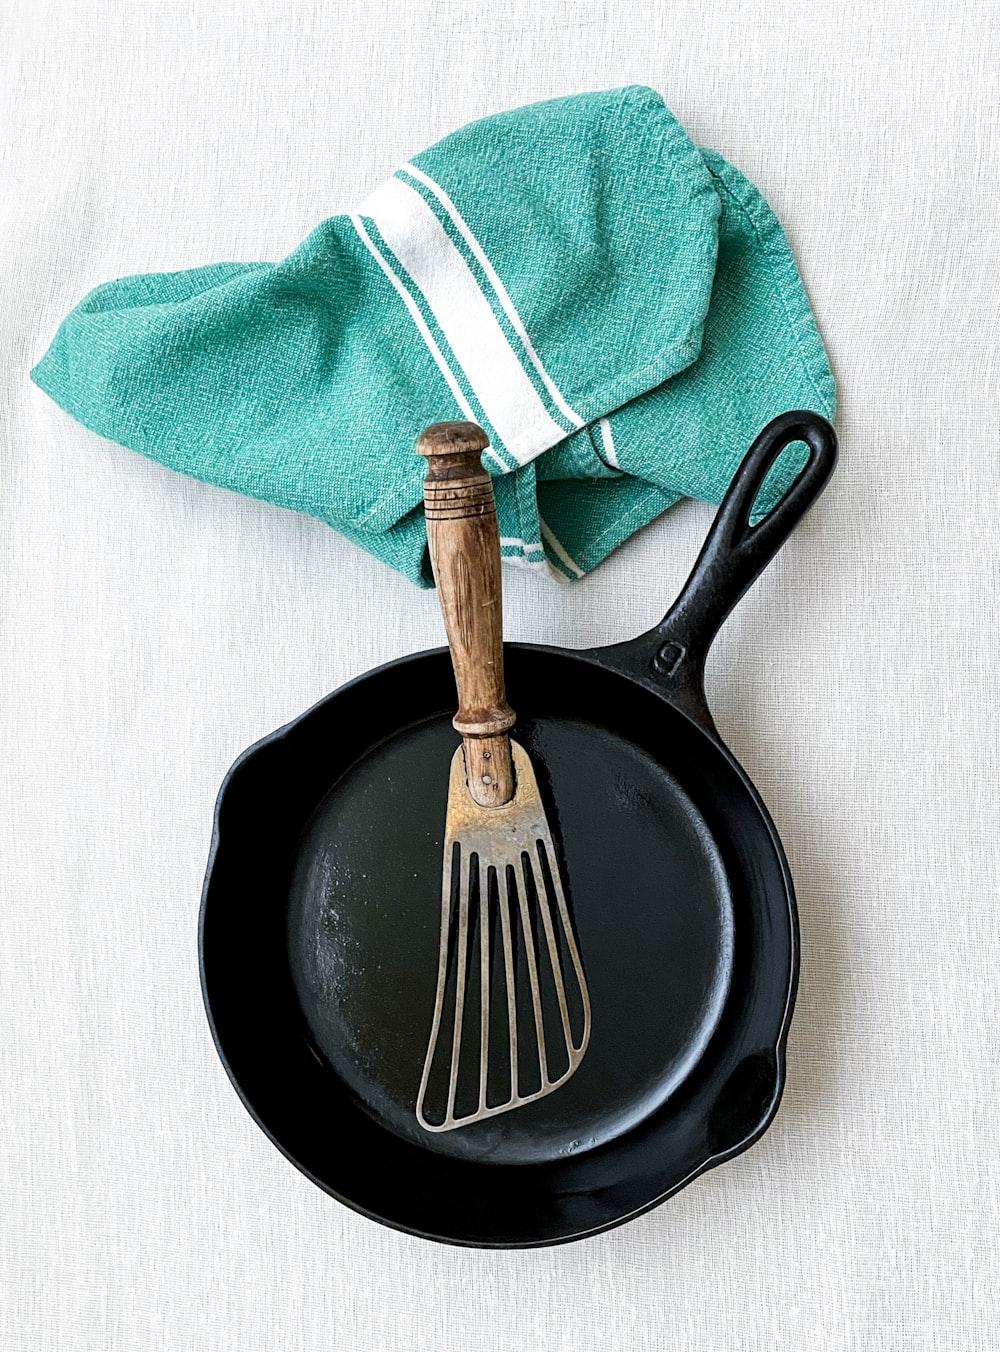 brown handle fork on black round plate